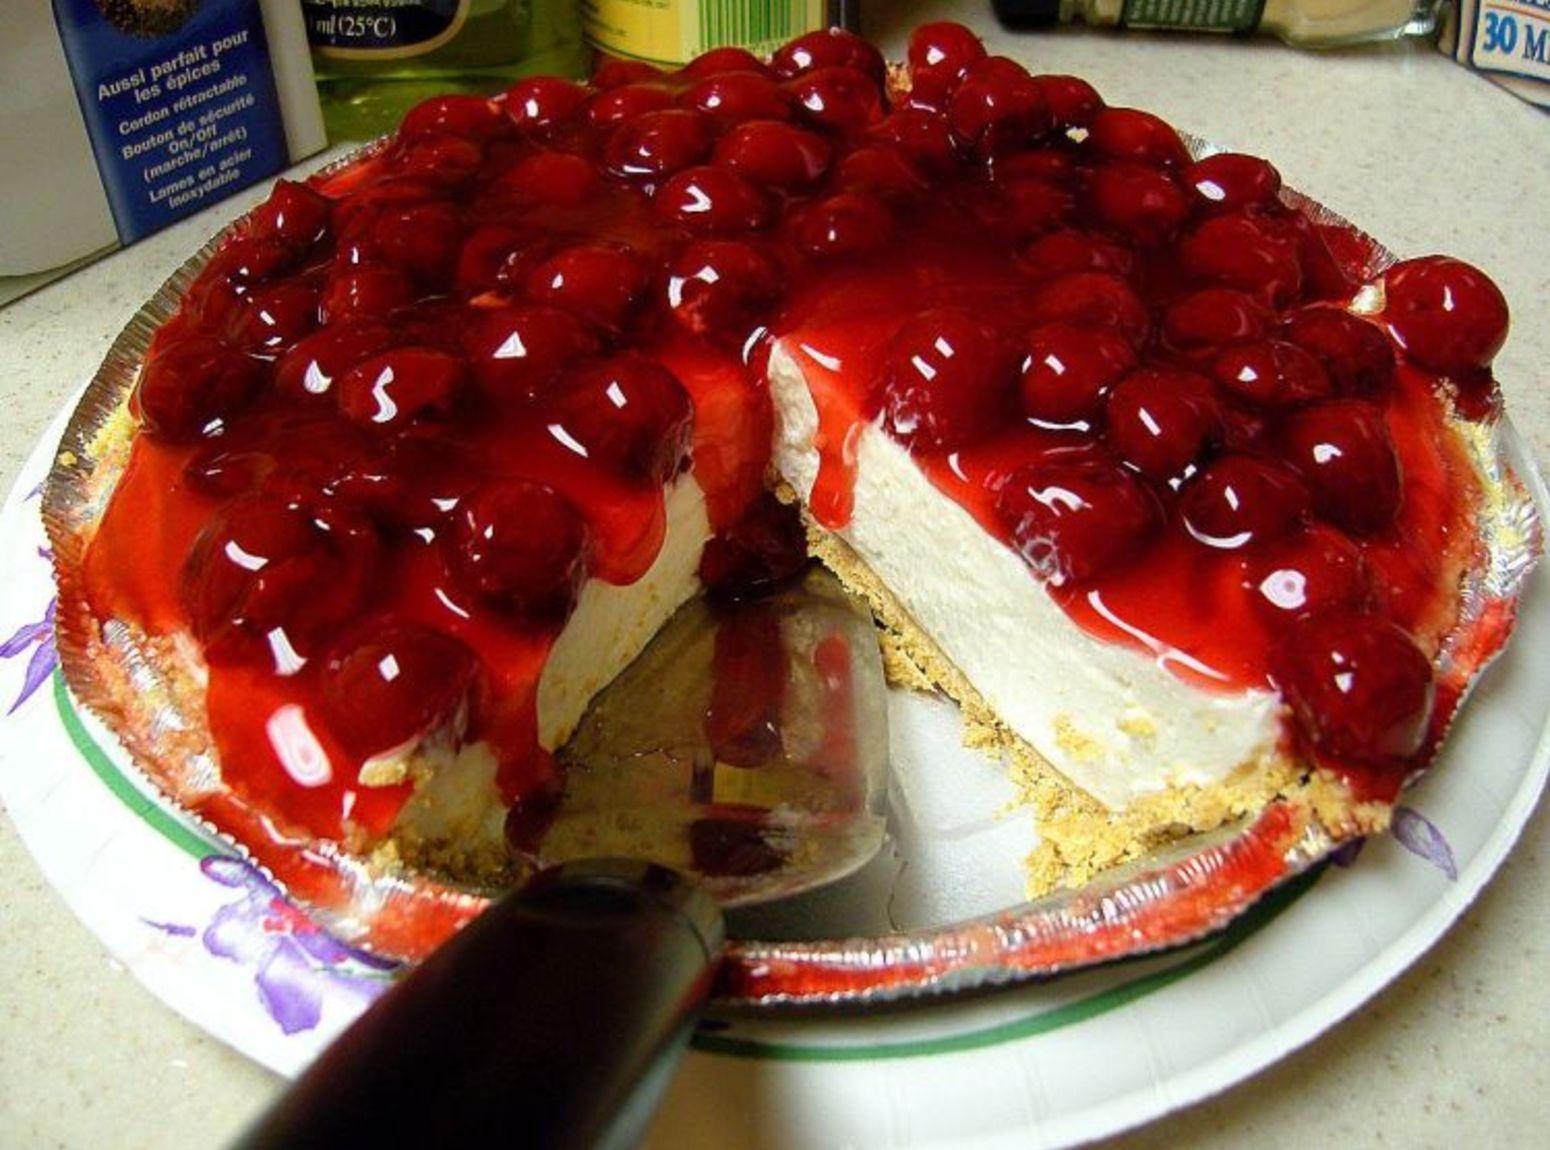 Easiest No Bake Cheesecake Recipe Cherry Cheesecake Recipe No Bake Cherry Cheesecake Easy No Bake Cheesecake